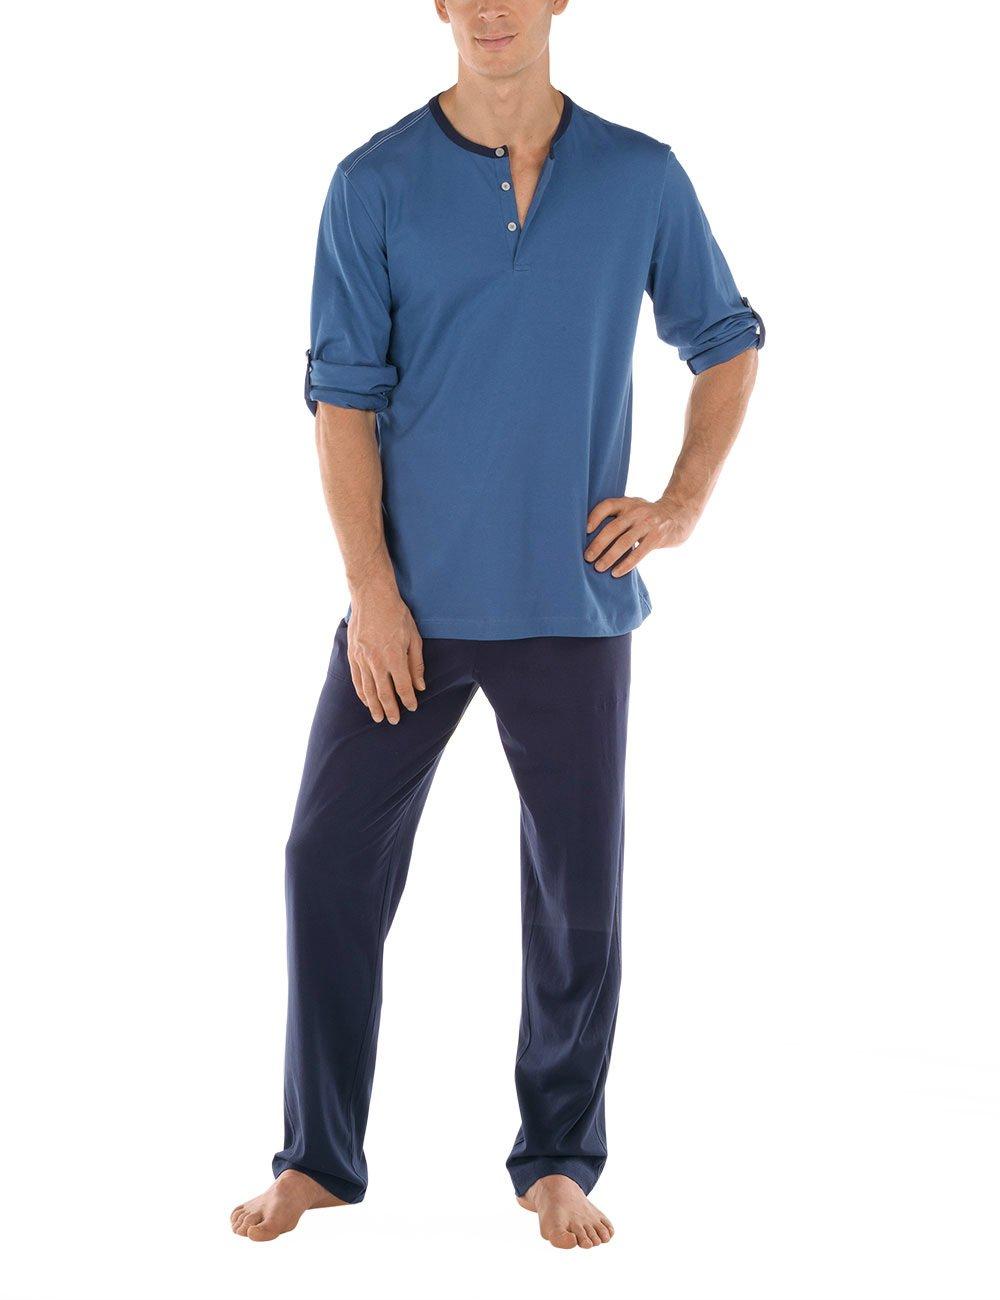 Calida mens cotton knit pajamas set Dakar 49168 (397, XX-large)